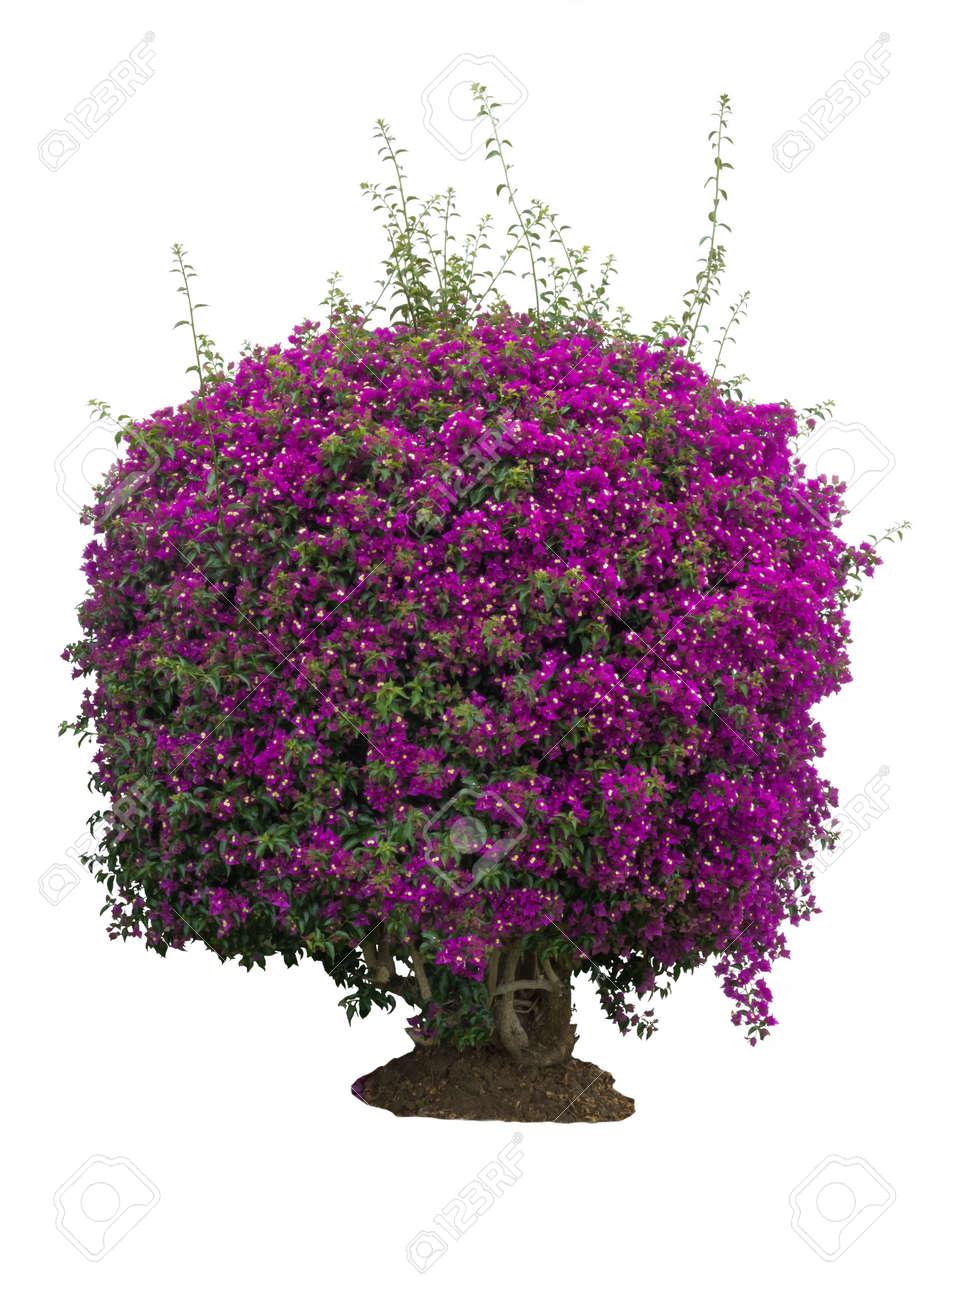 Big Bush Of Tropical Plant Bougainvillea With Purple Flowers